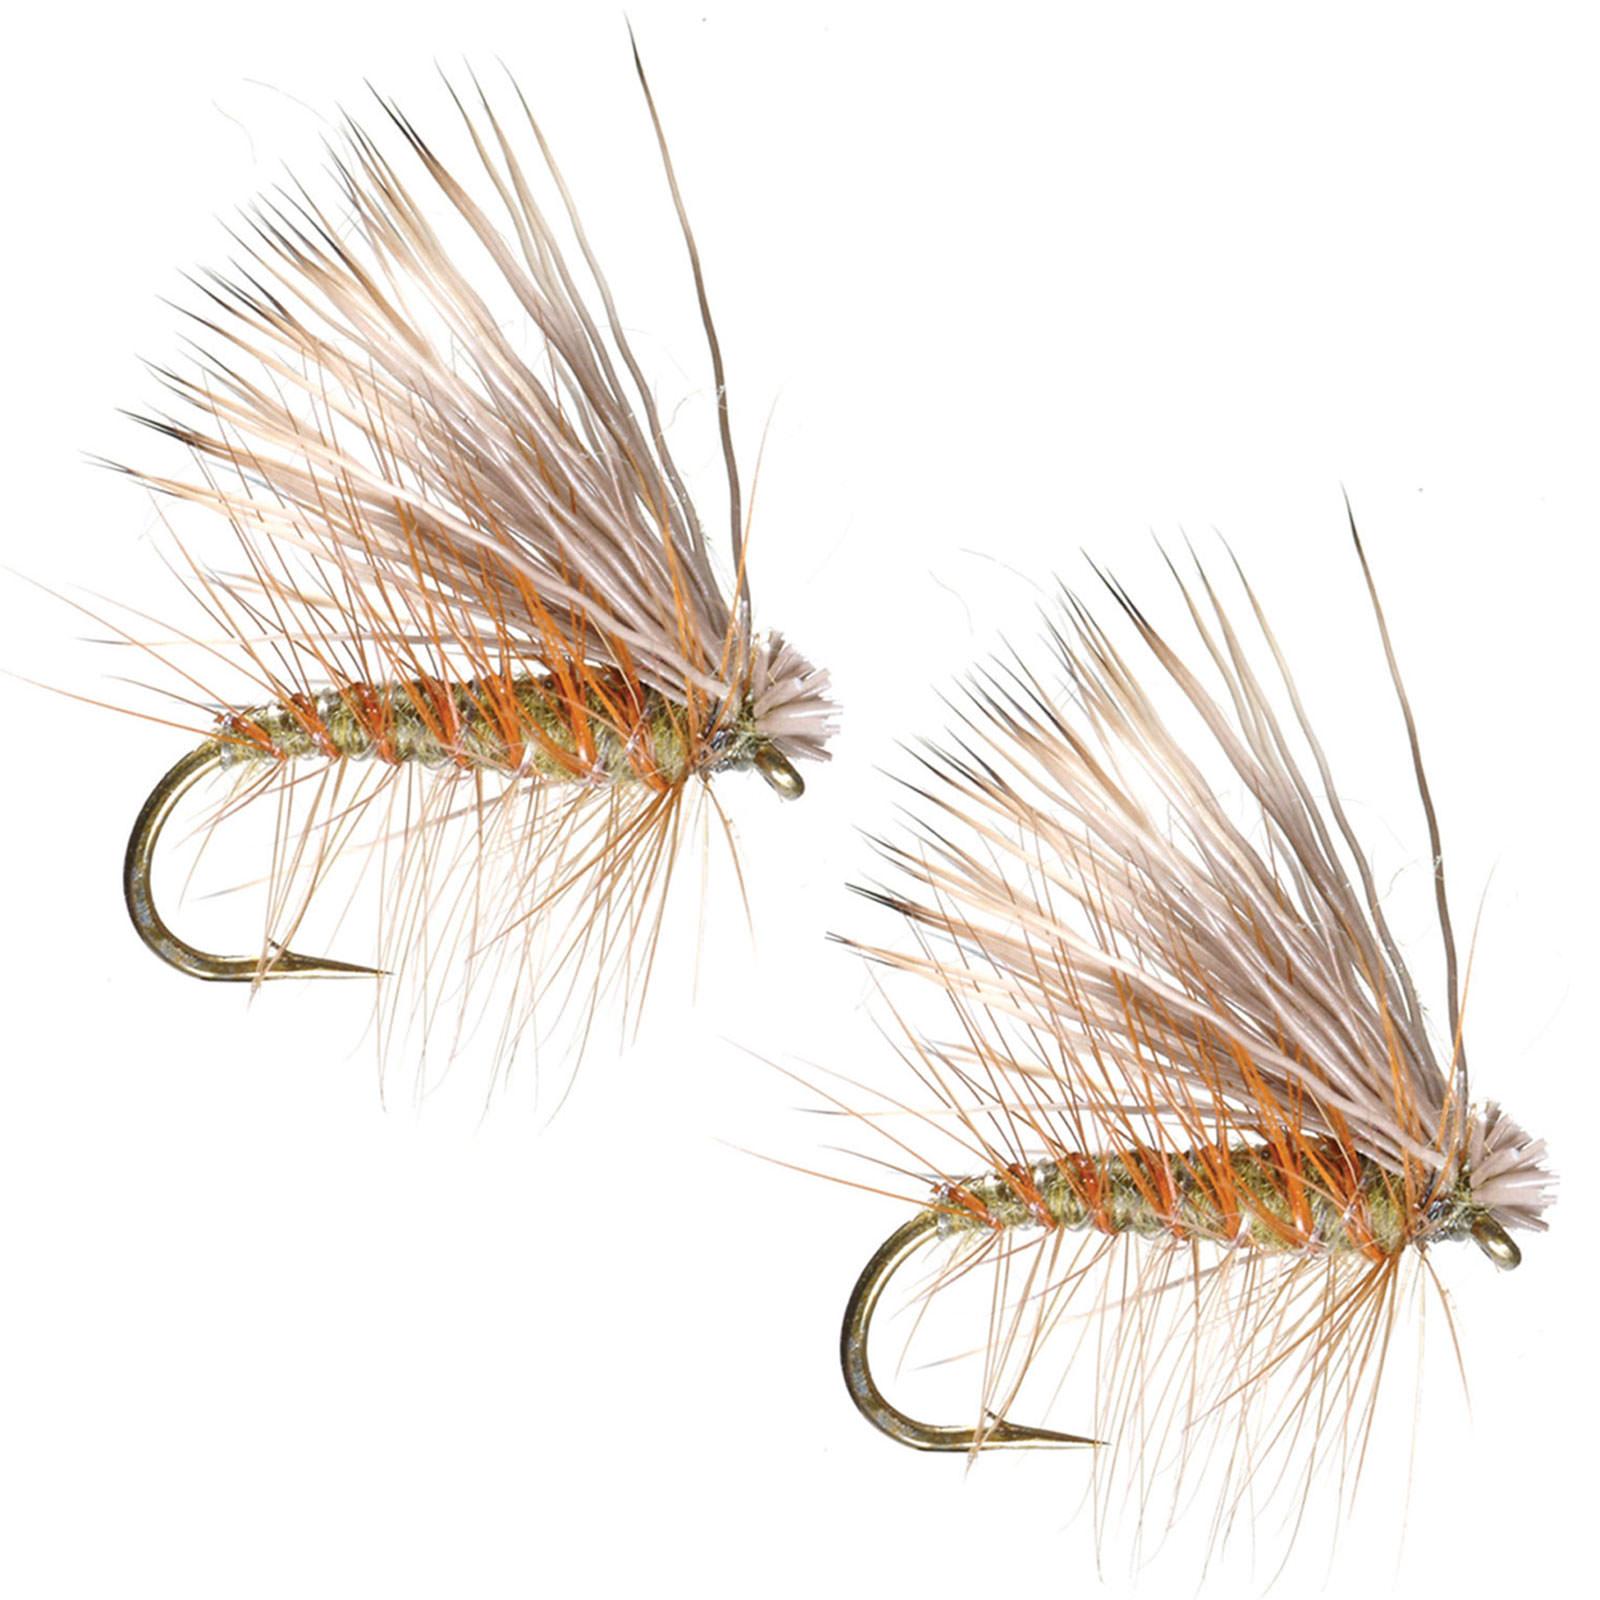 Umpqua elk hair caddis olive fly fishing dry flies multi for Fly fishing flys